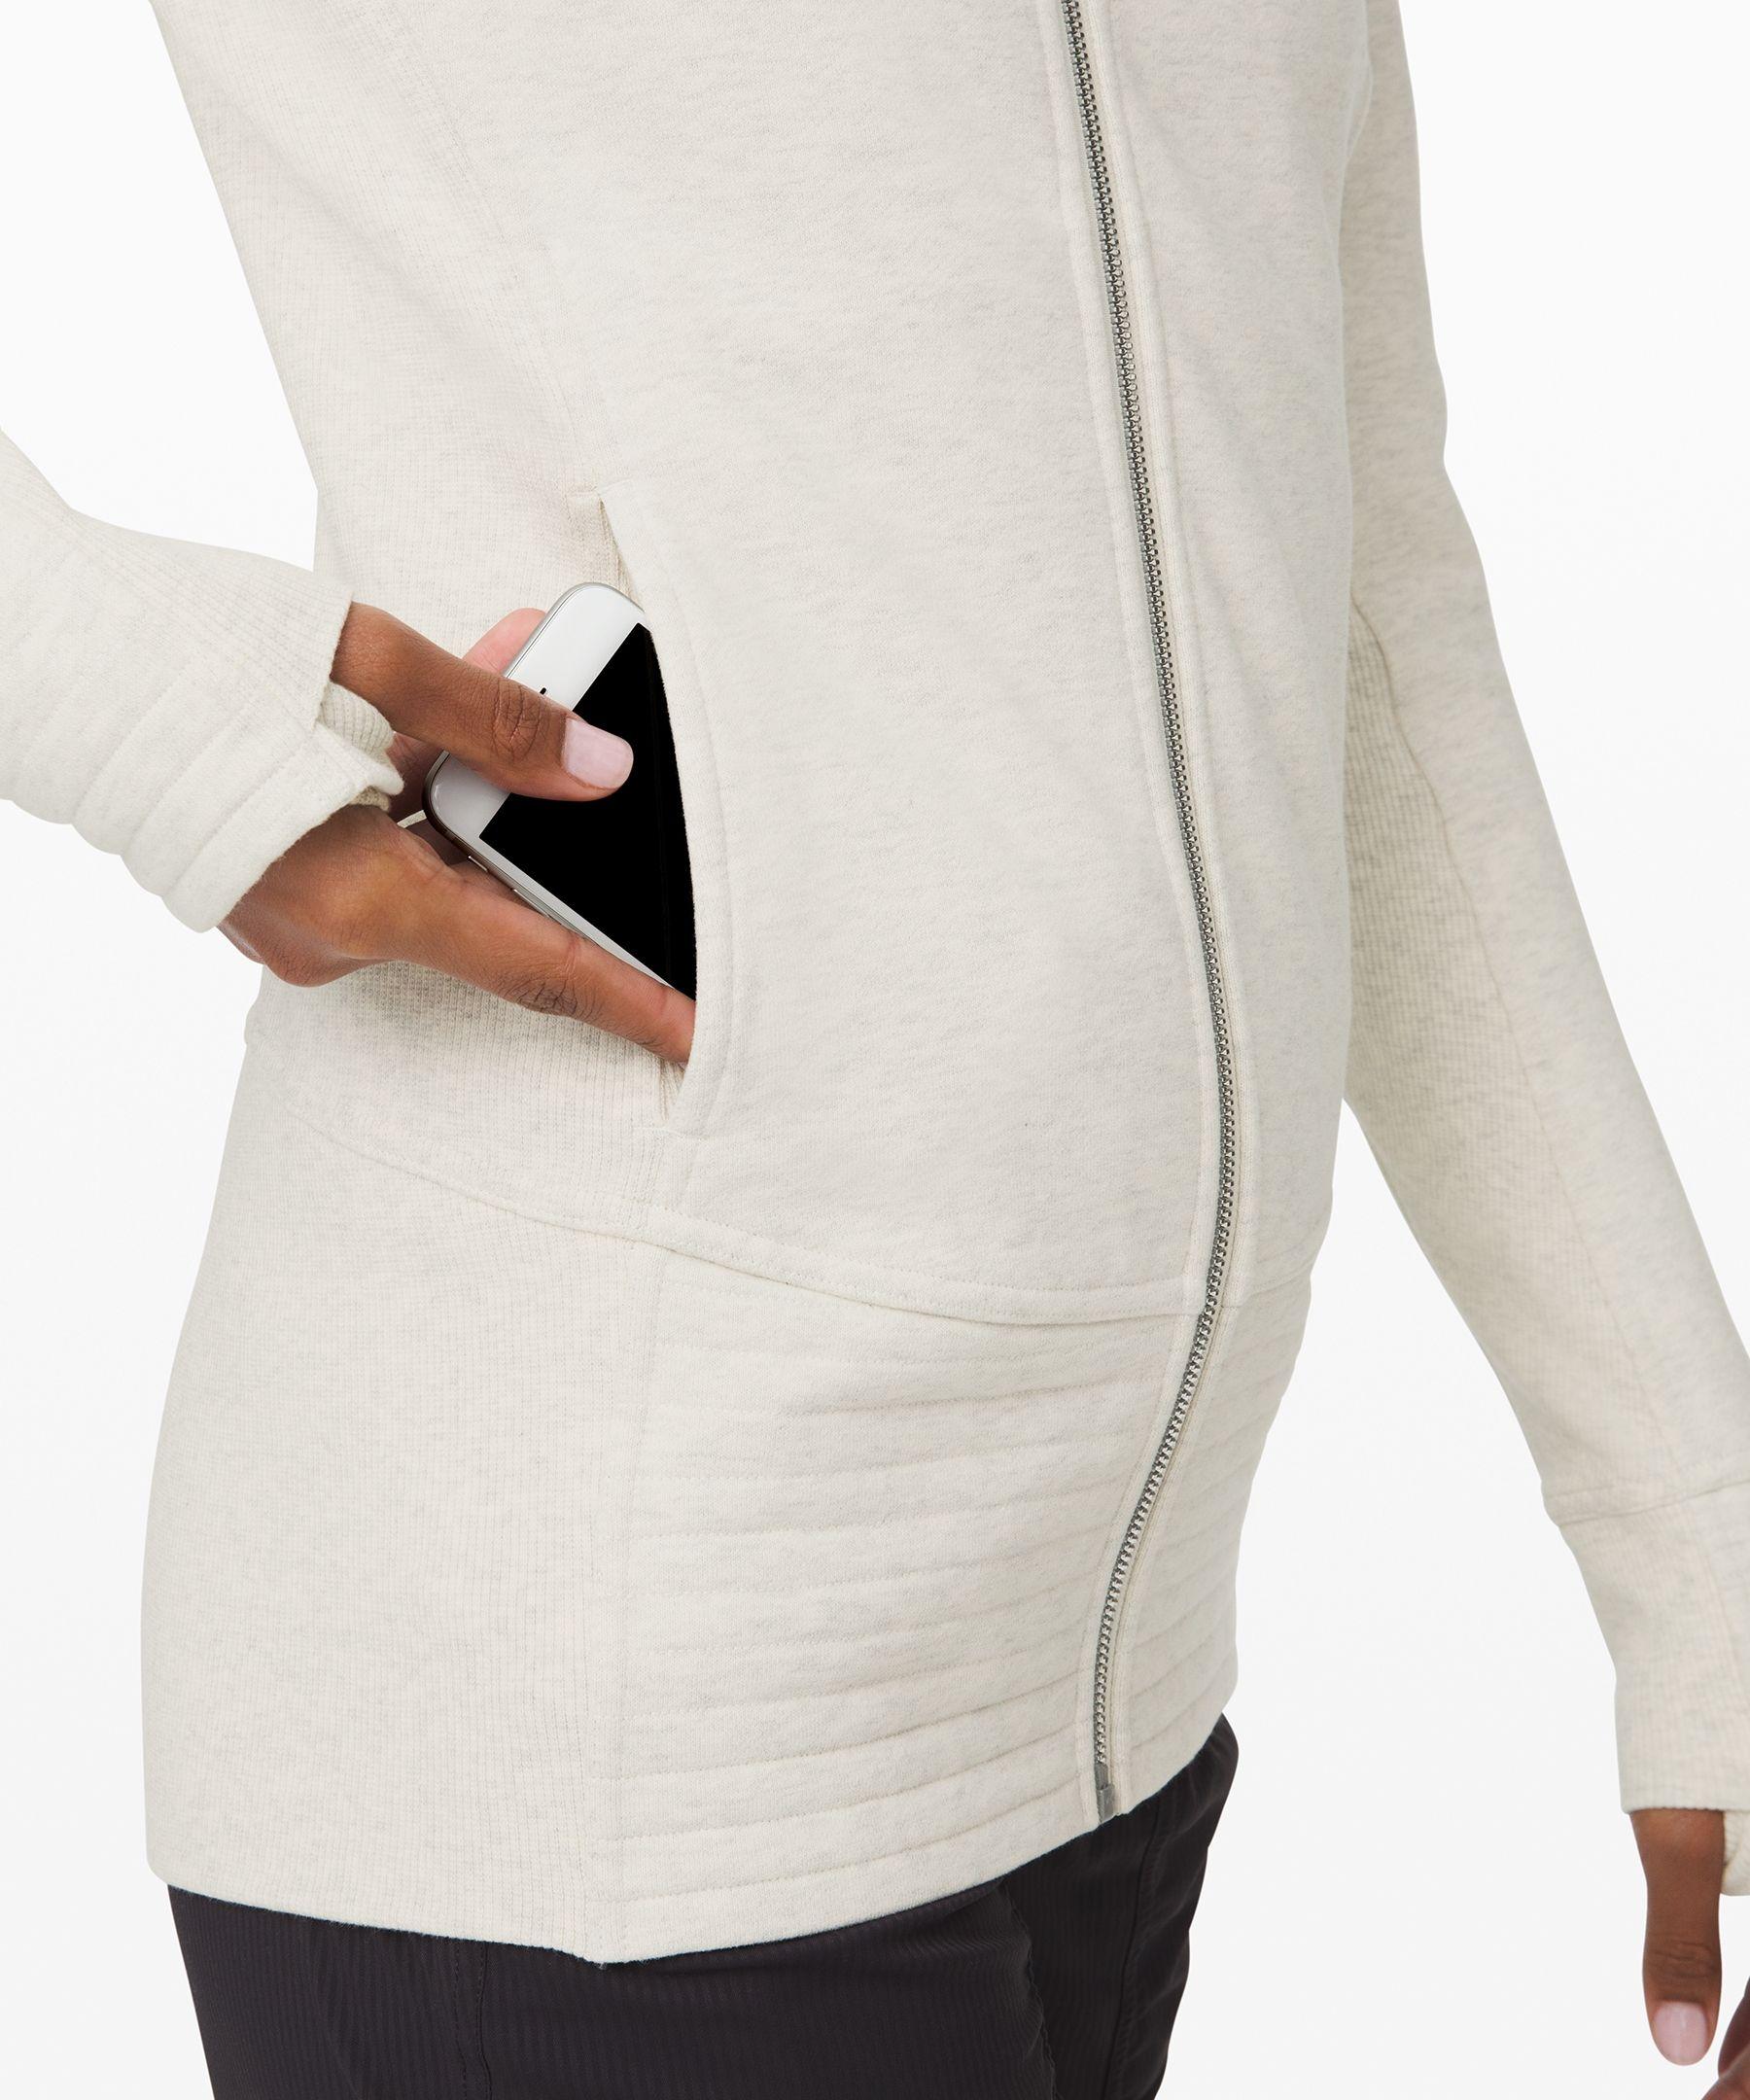 Radiant Jacket II | Women's Jackets + Outerwear | lululemon athletica 3